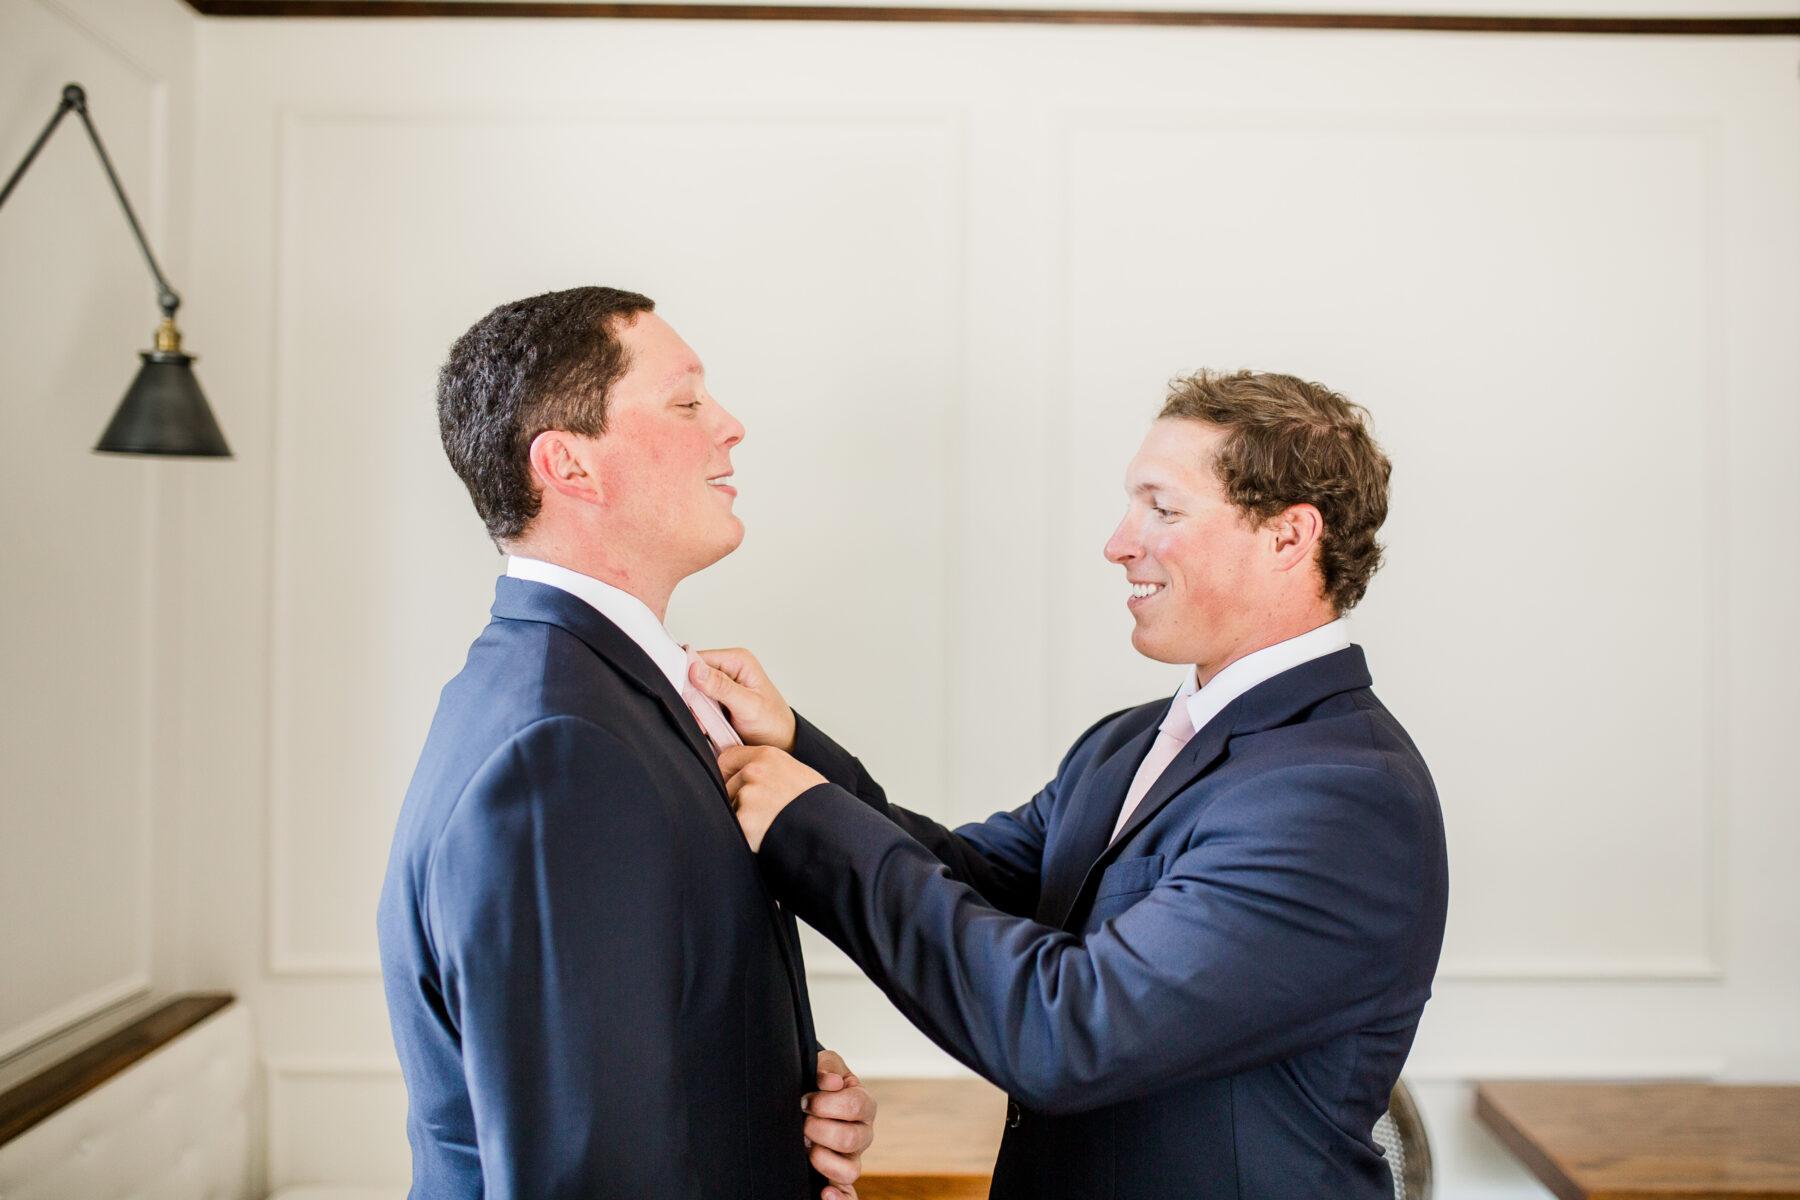 Navy blue grooms tuxedo   Nashville Bride Guide